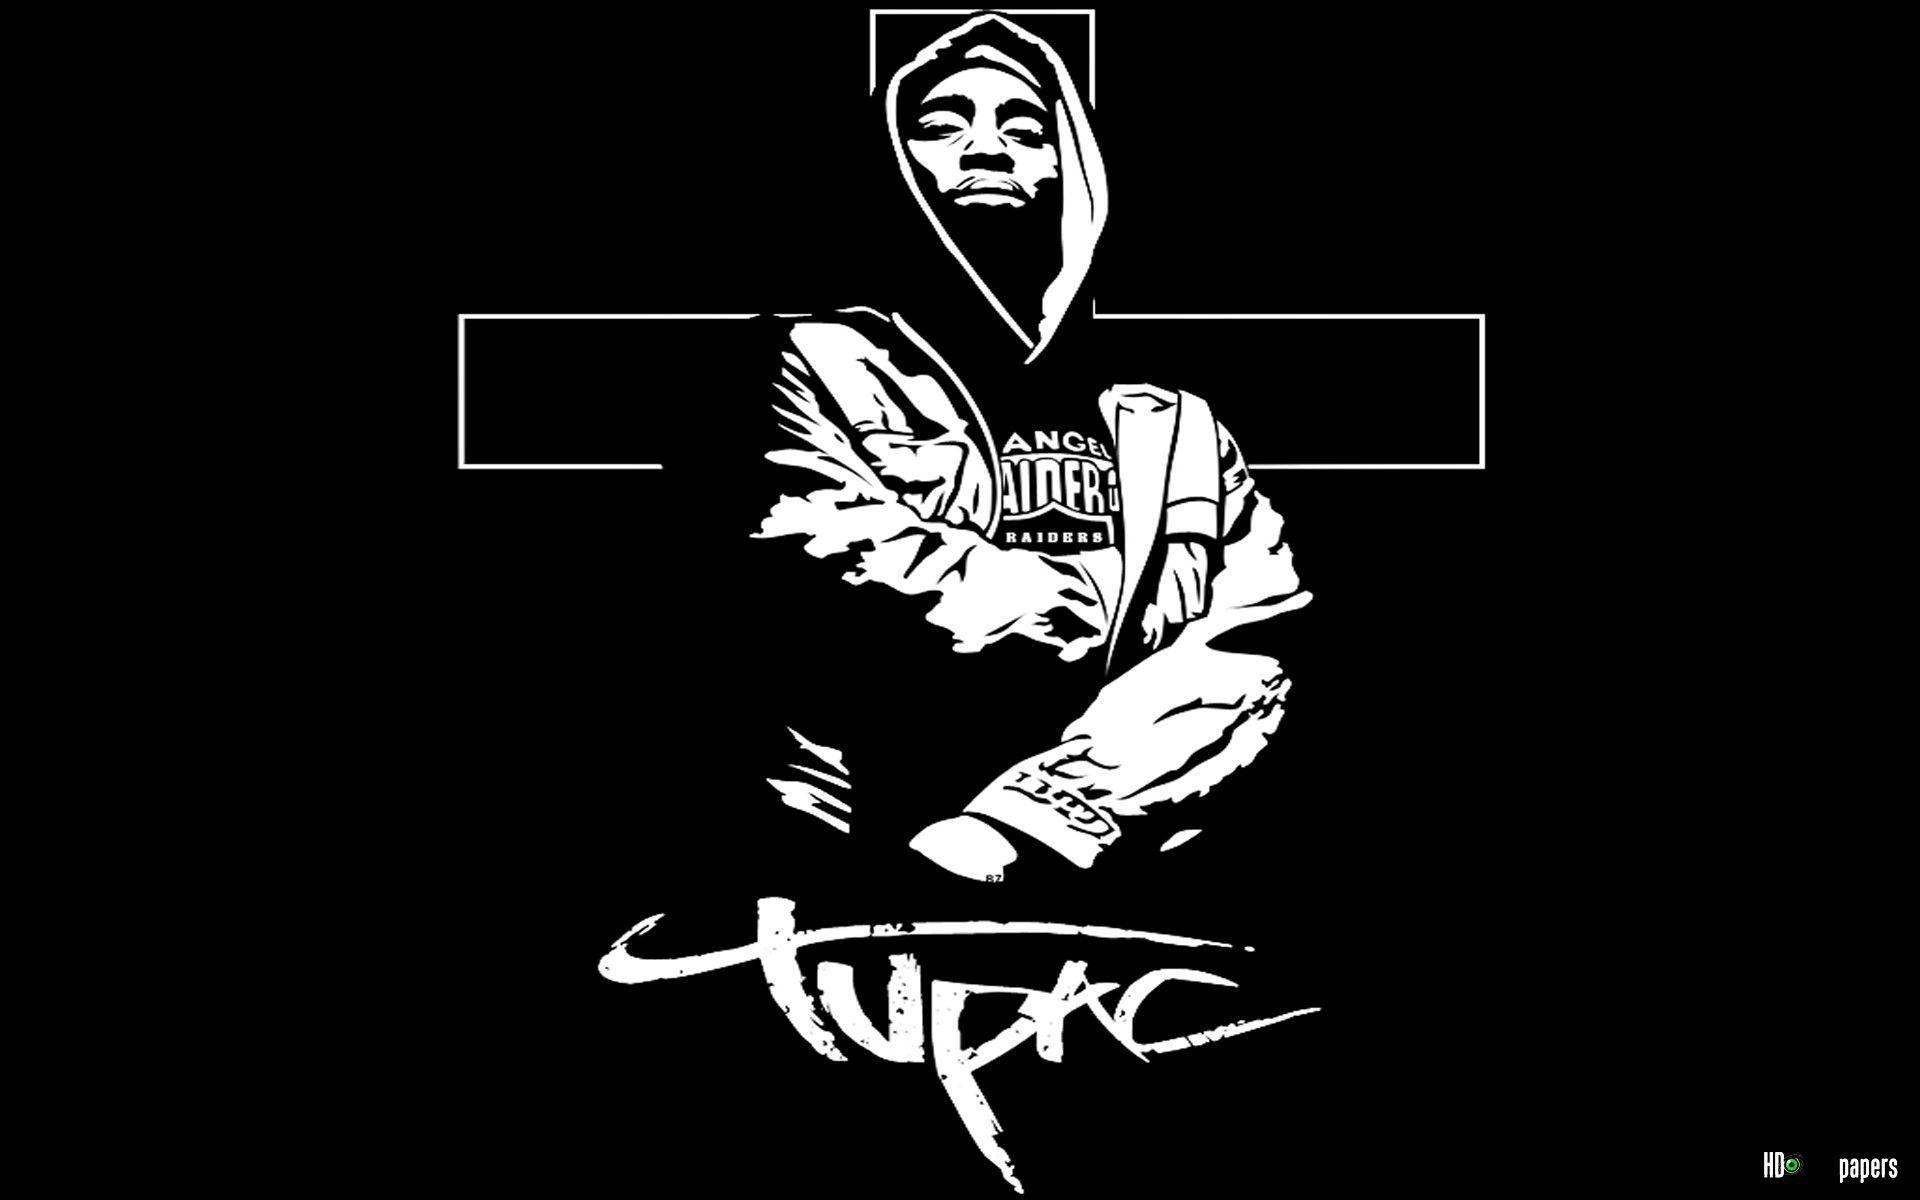 Tupac Shakur Wallpapers Top Free Tupac Shakur Backgrounds